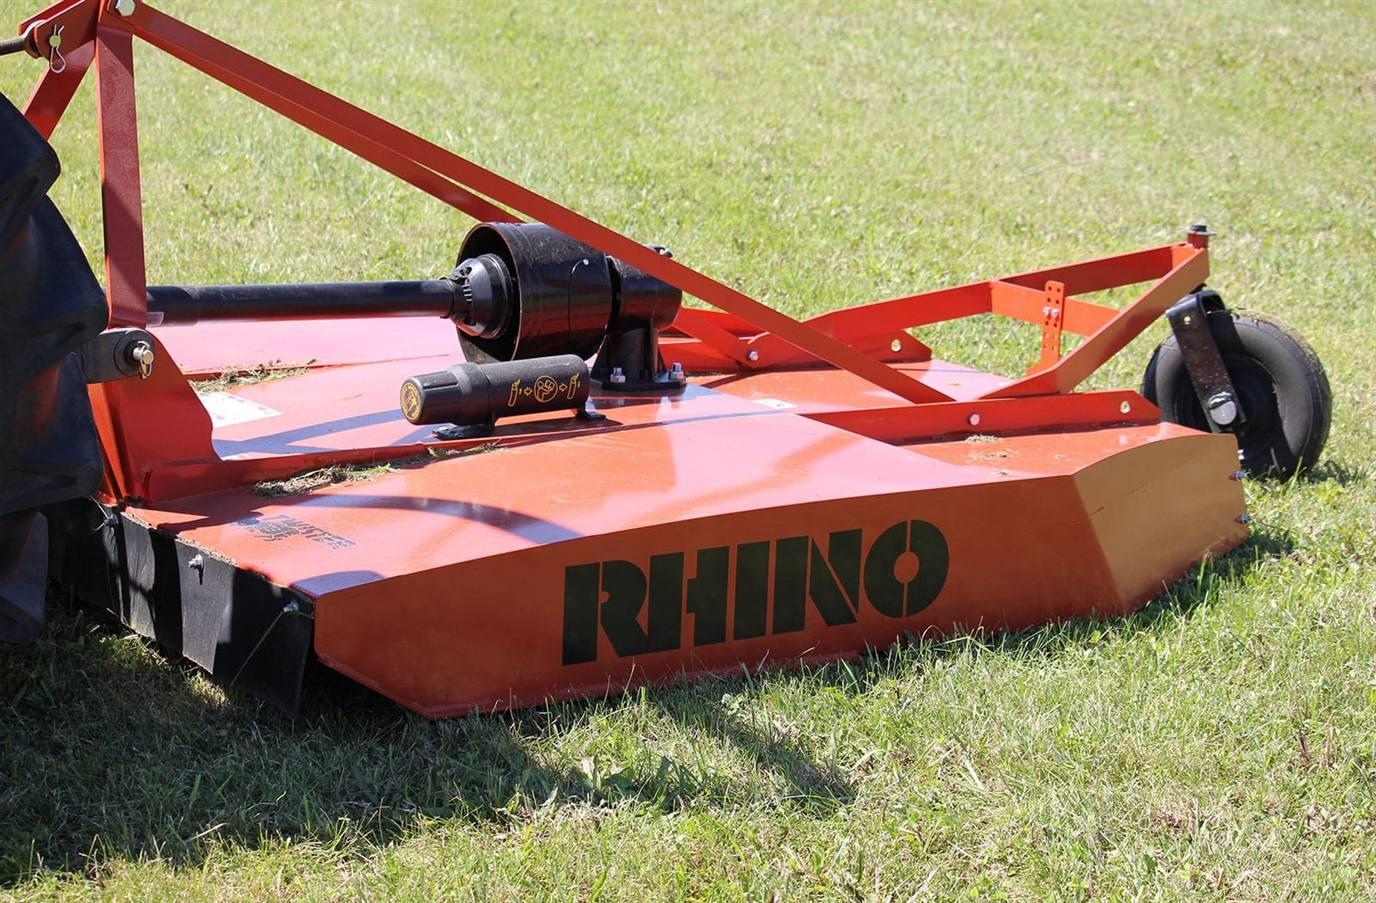 Inventory from RhinoAg Evolution Ag, LLC